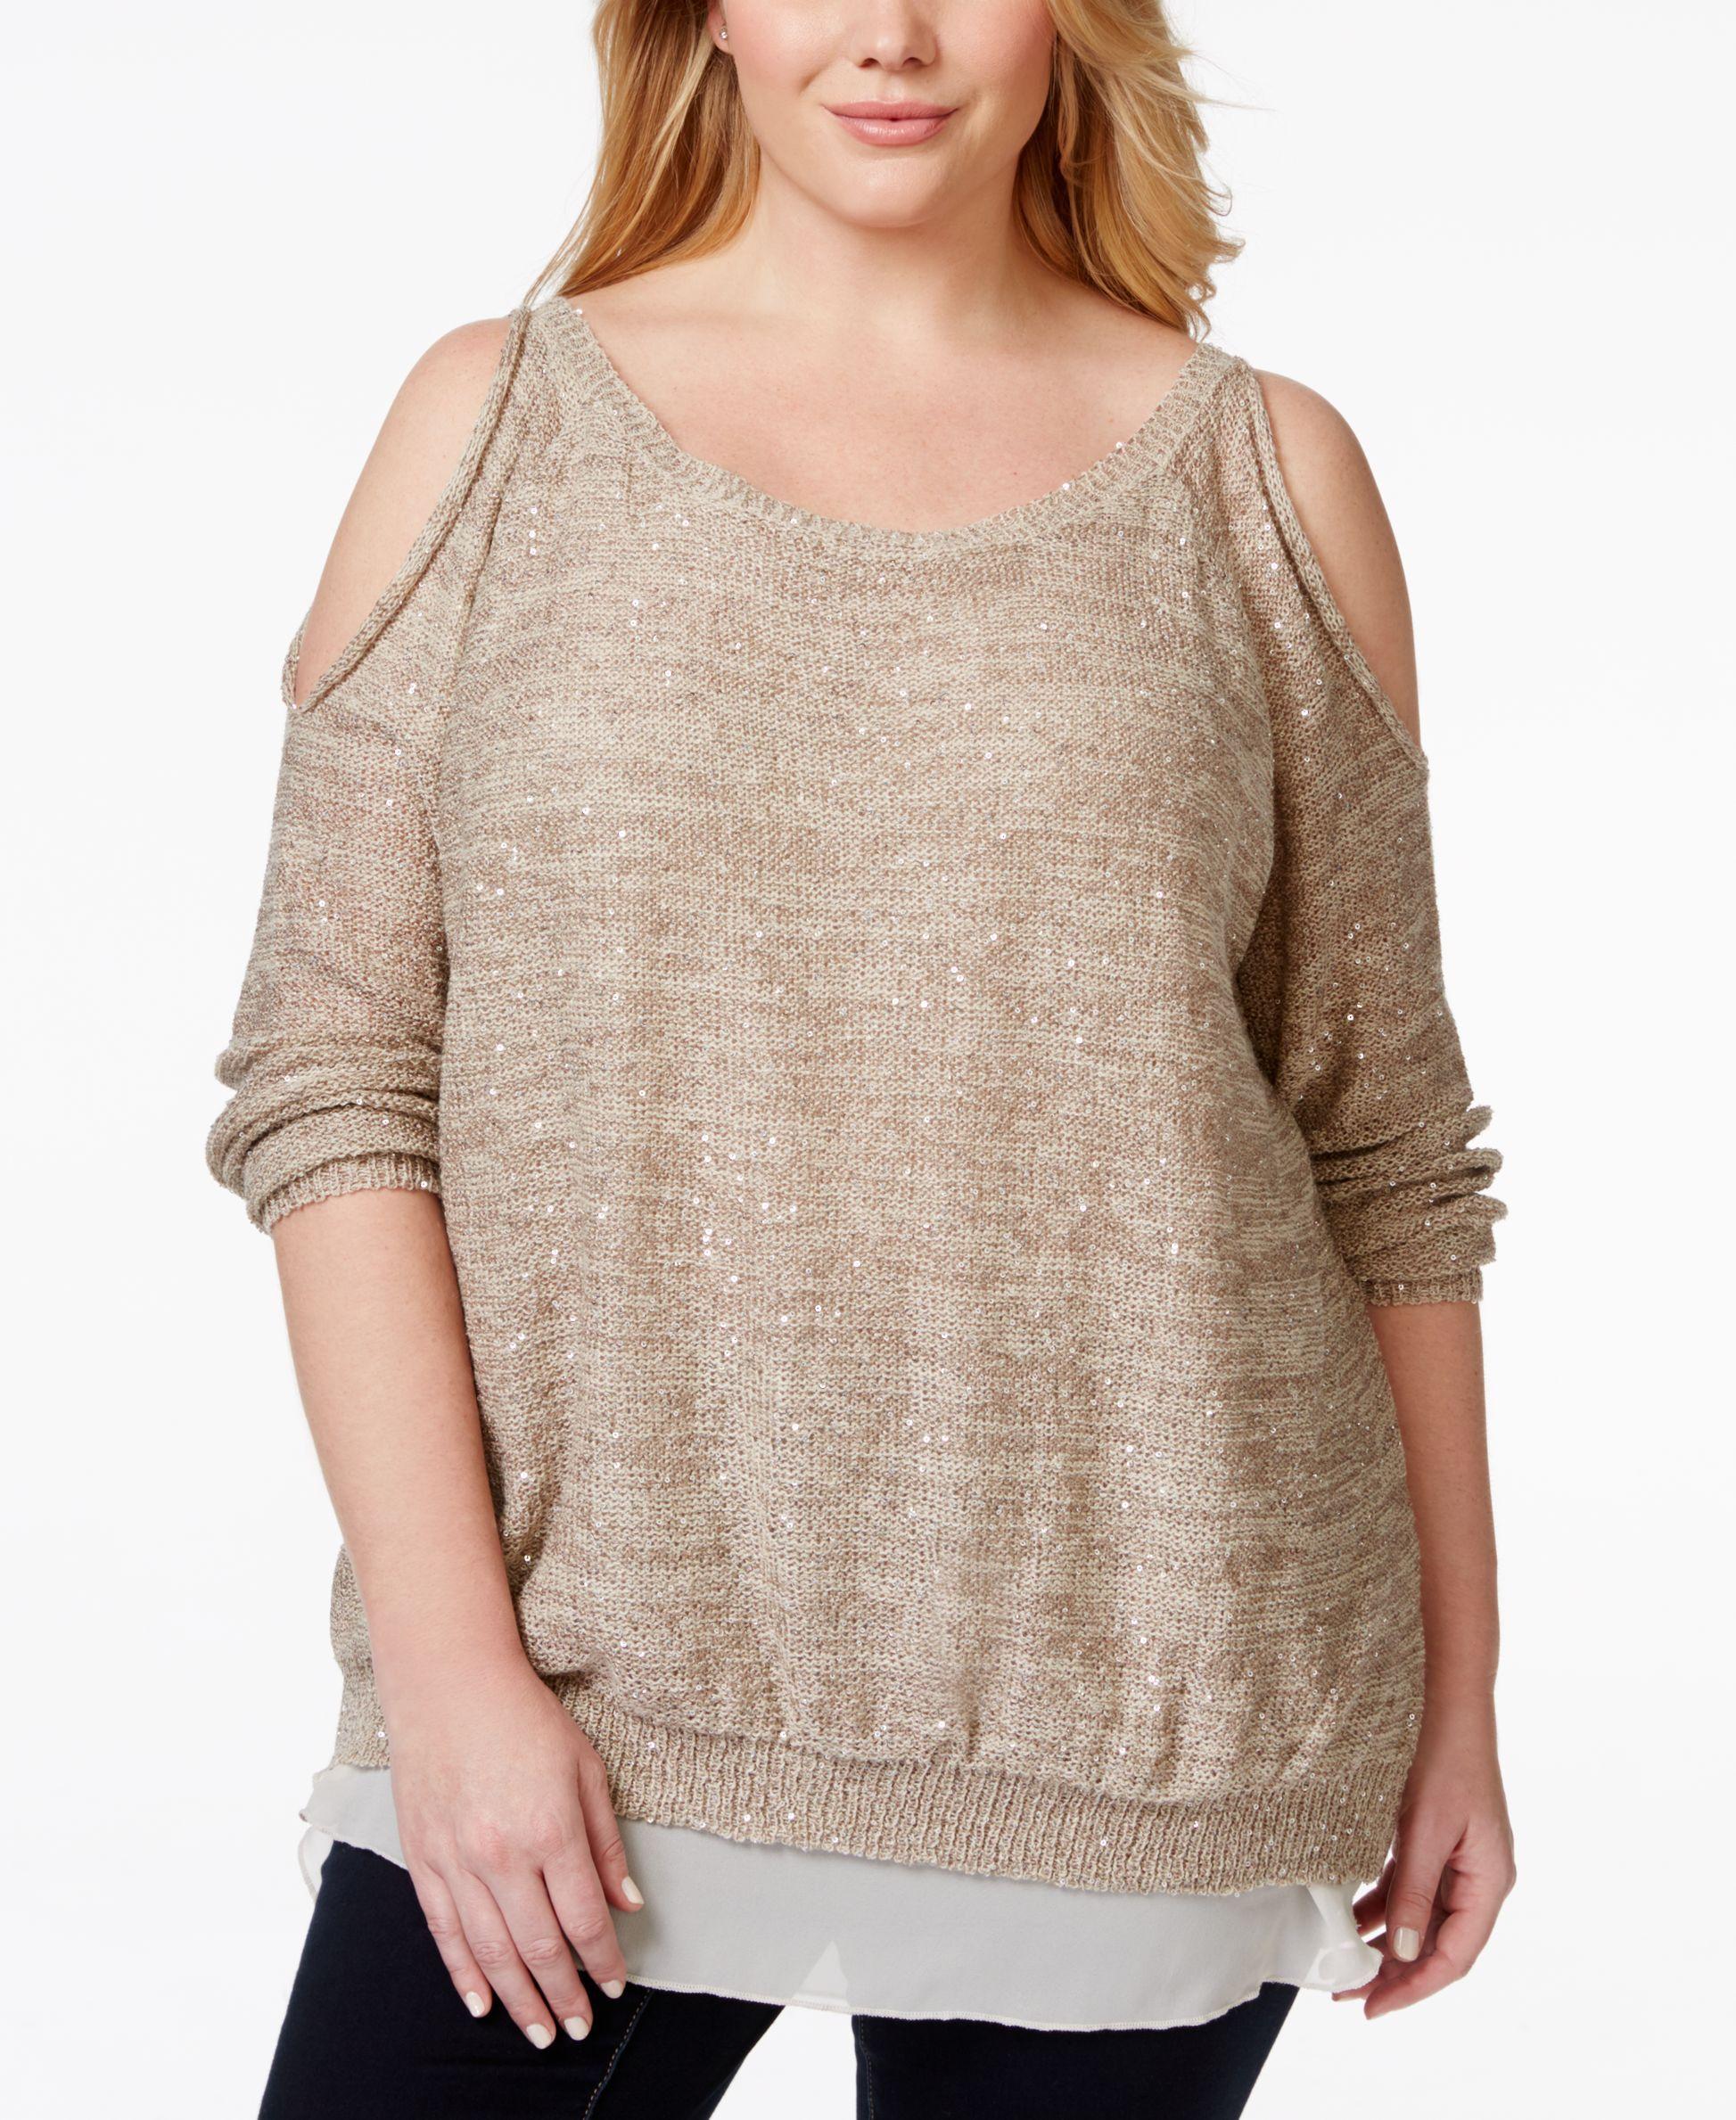 Jessica Simpson Plus Size Tearose Cold-Shoulder Sequin Top